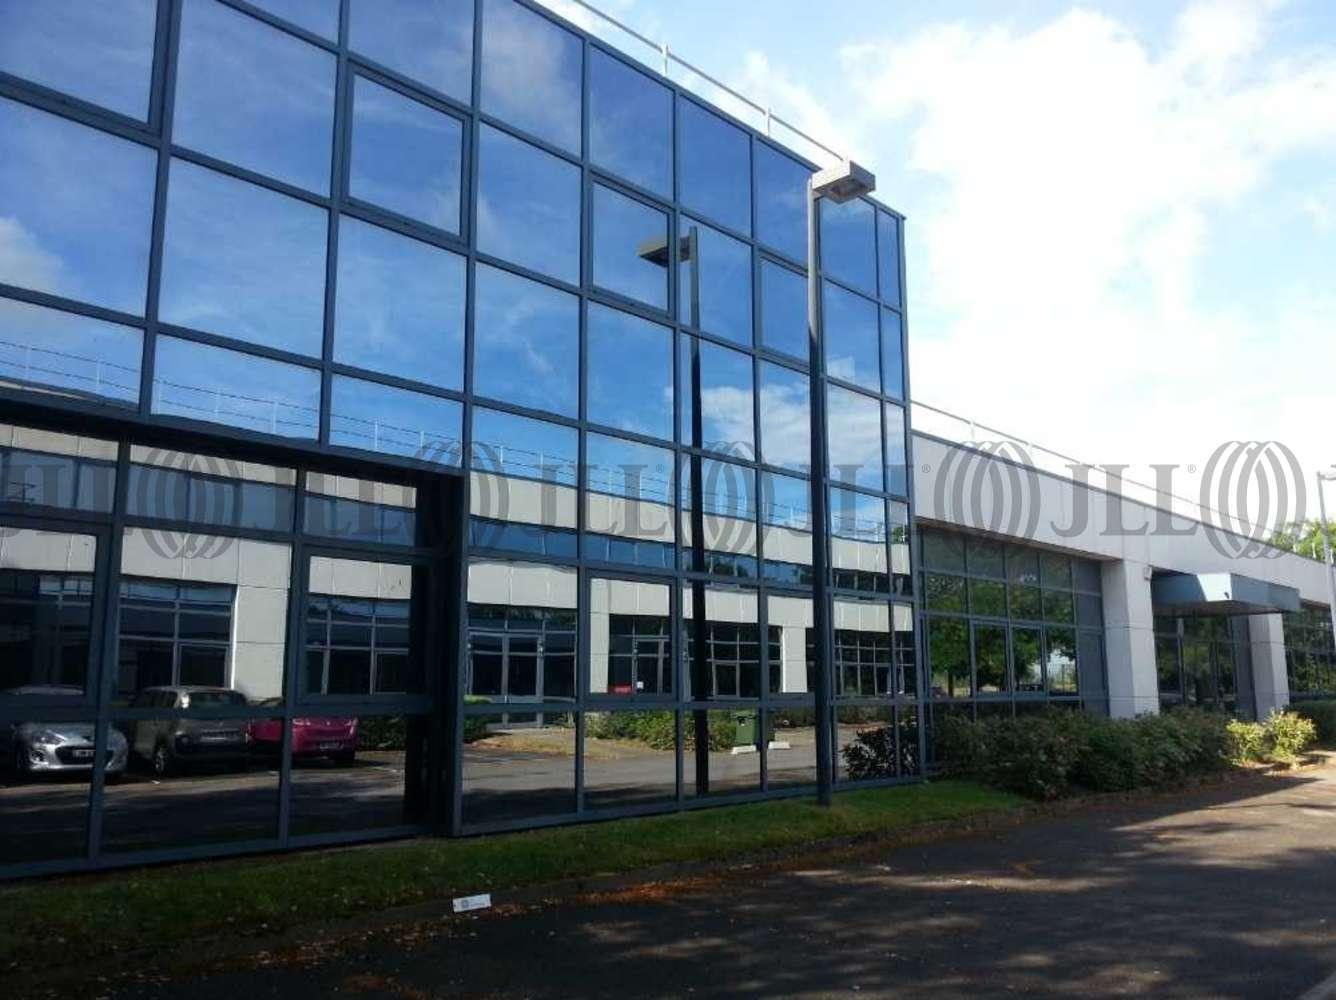 Activités/entrepôt Saclay, 91400 - ARIANE - DOMAINE TECHNOLOGIQUE DE SACLAY